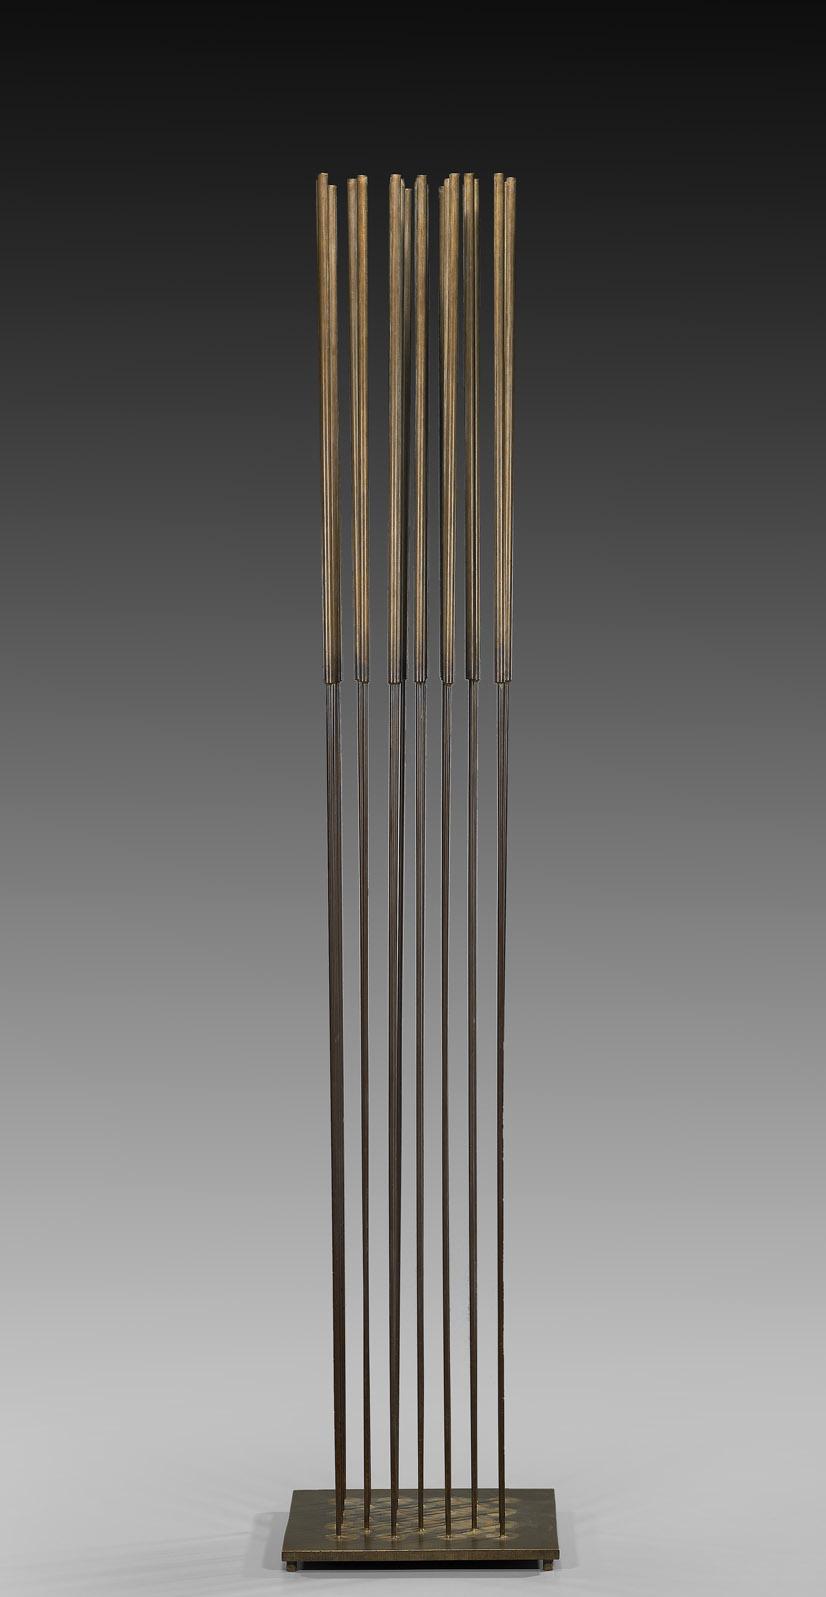 Sonambient , circa 1970  beryllium copper and brass  50 x 10 x 10 inches; 127 x 25.4 x 25.4 centimeters